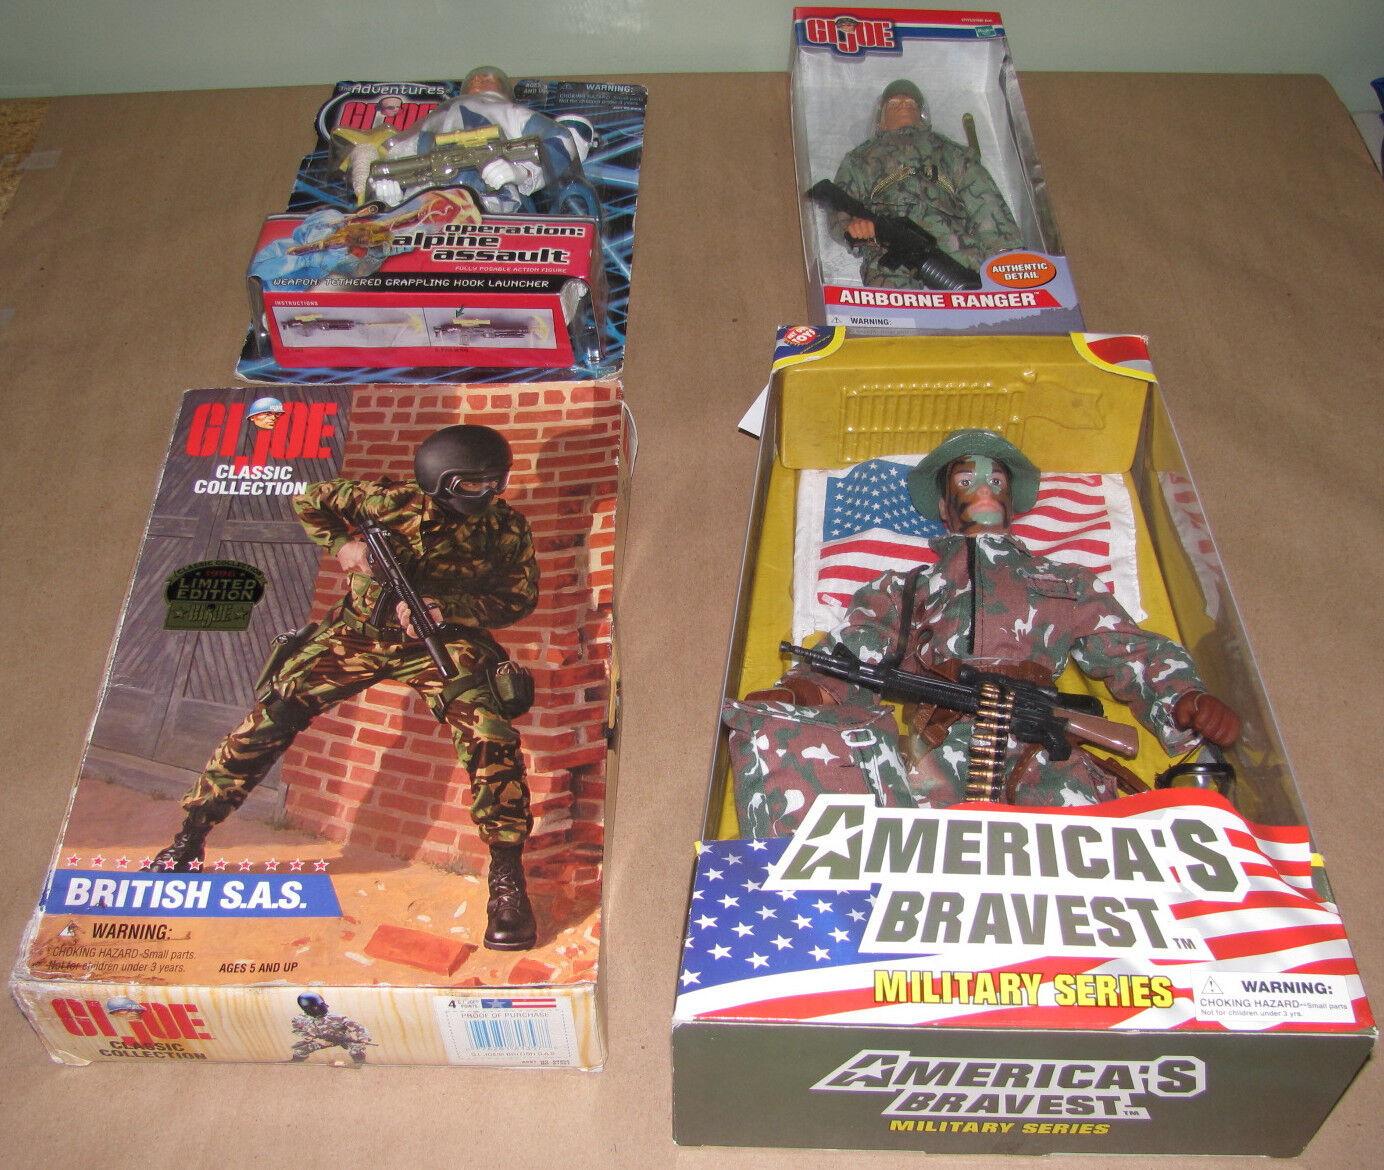 Lot of  Action Figures Includes G.I. Joe 2010, Airborne Ranger, etc. USC 901